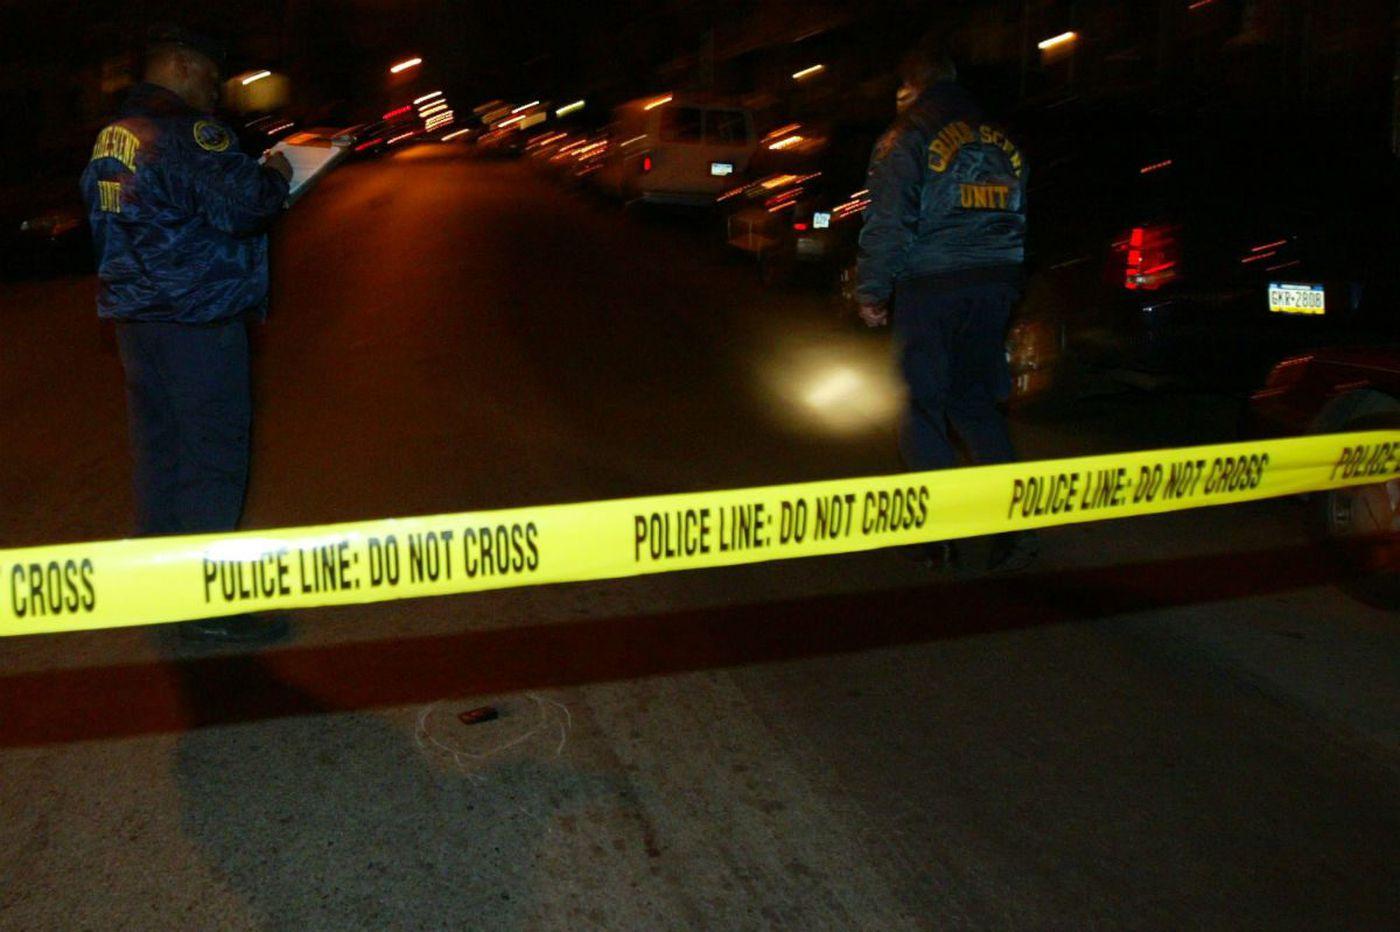 Man shot, killed execution style in N.J. Applebee's